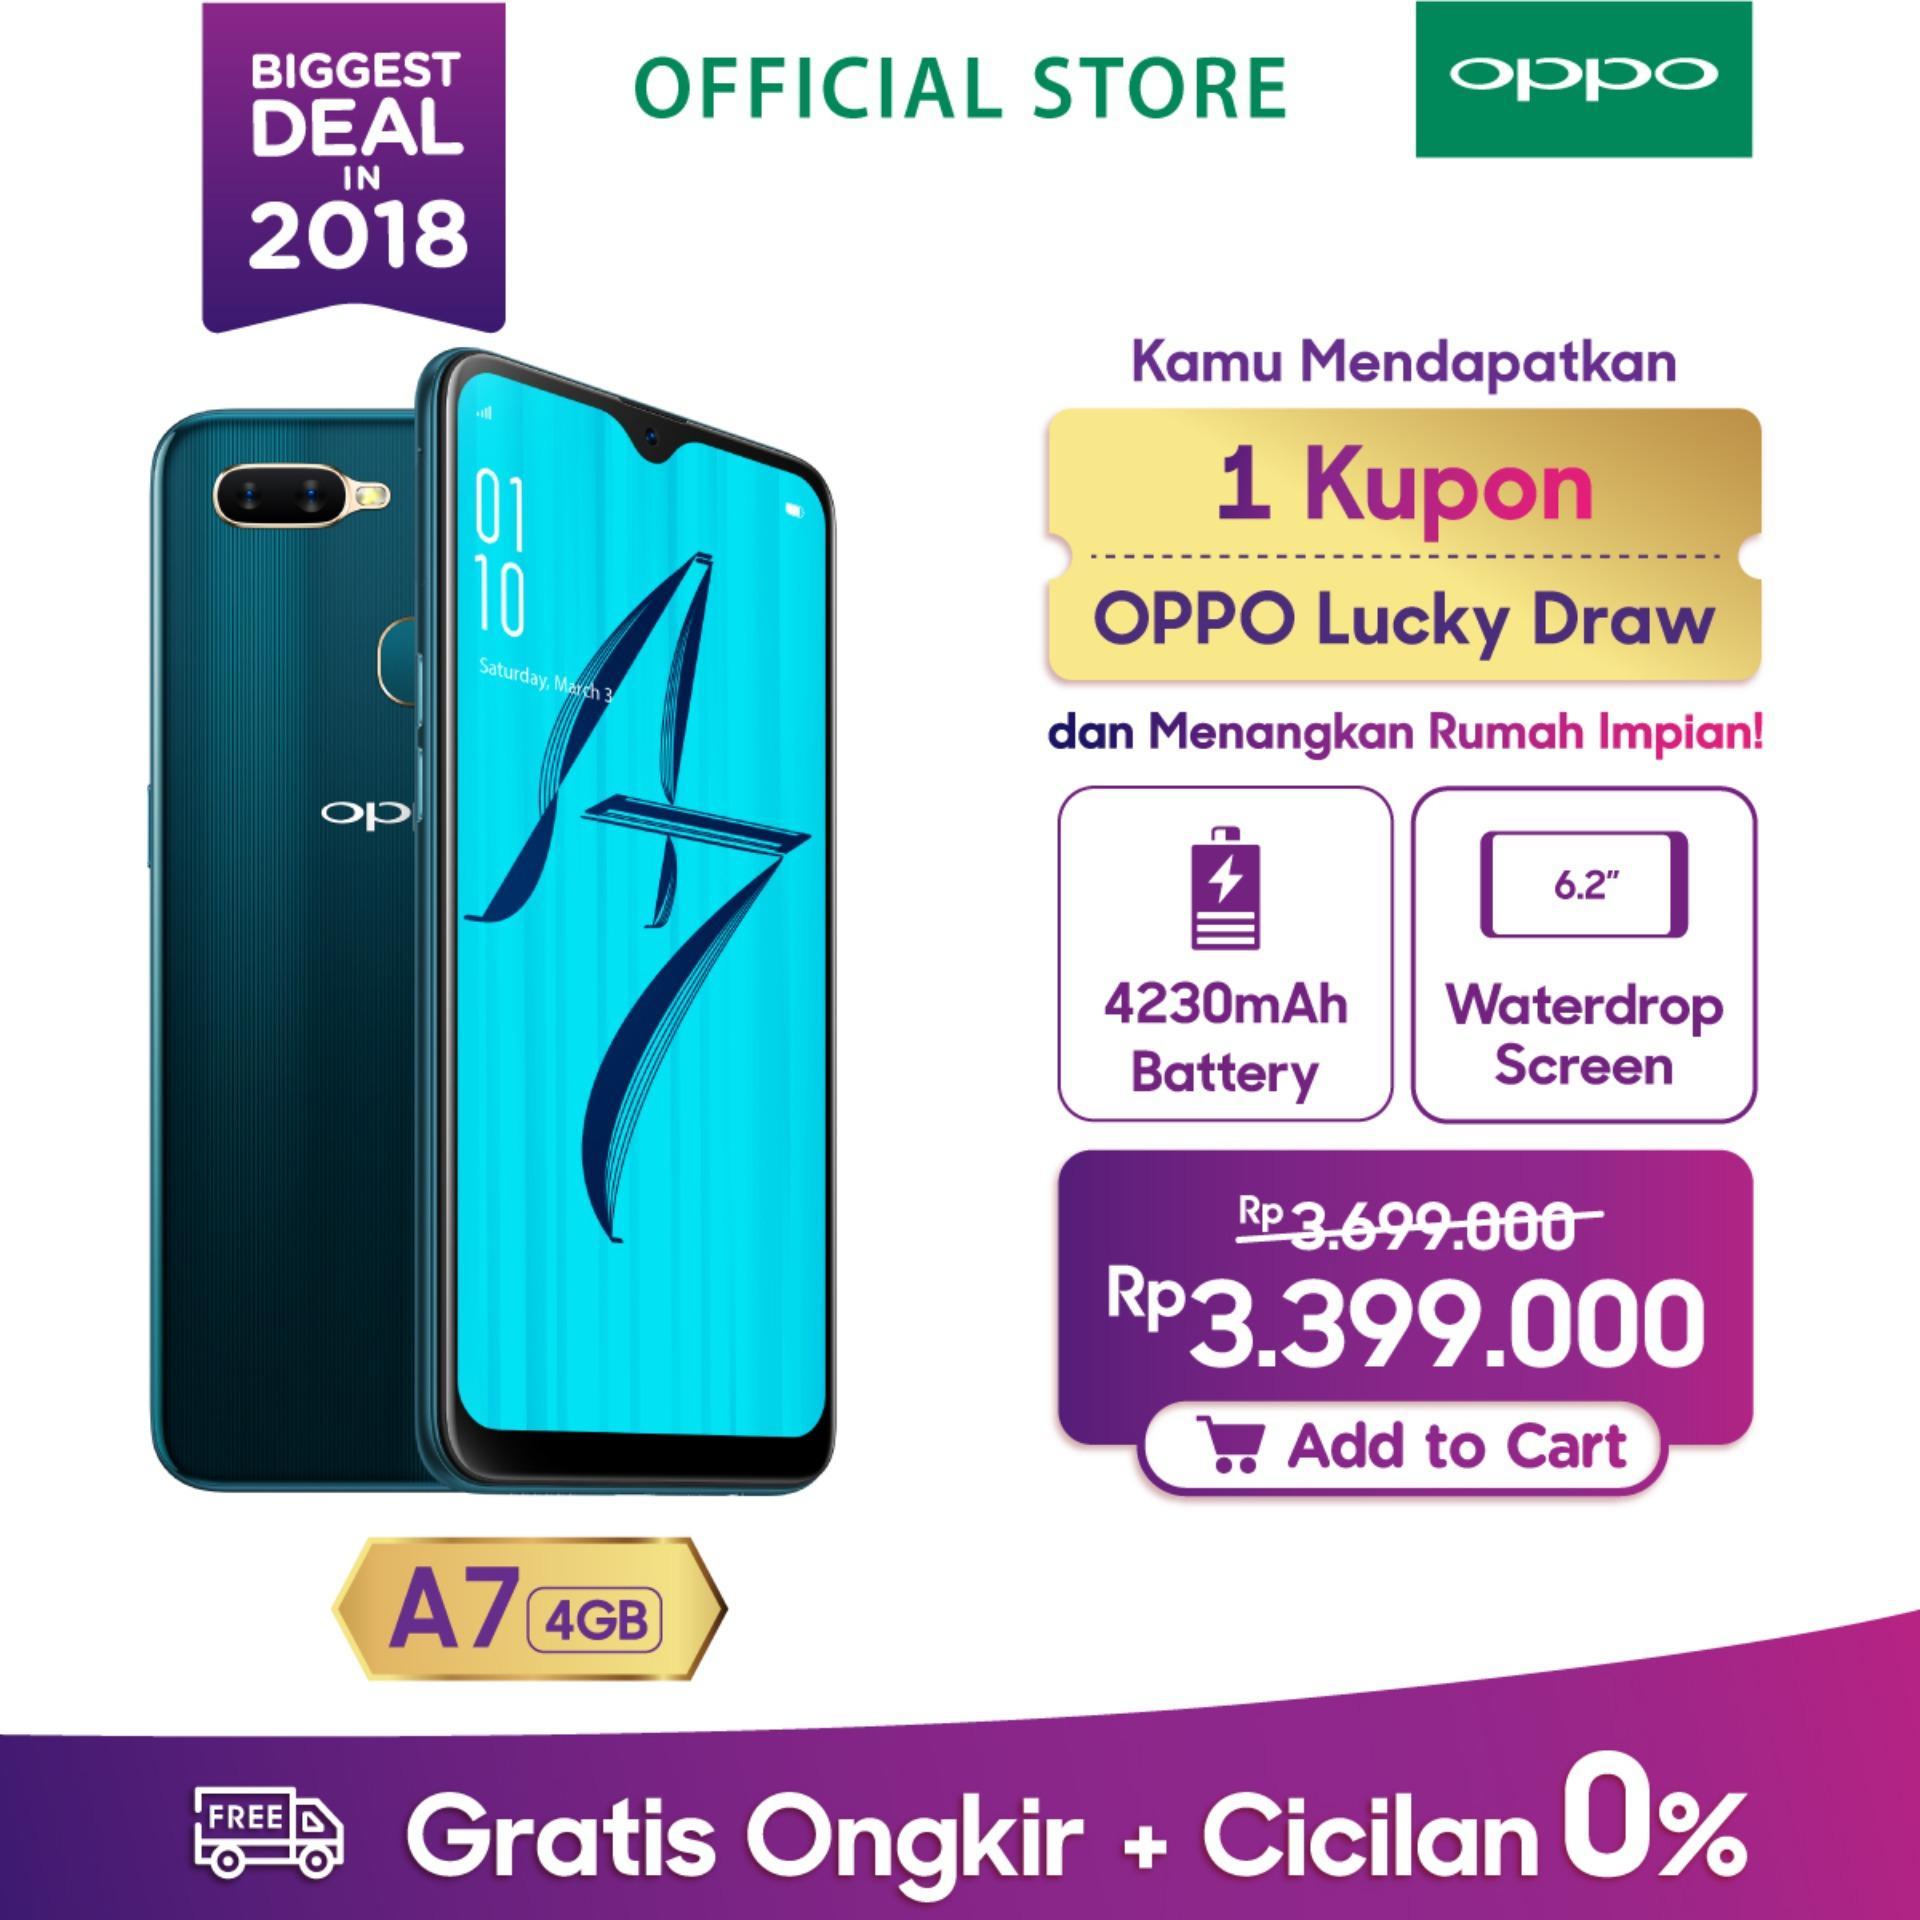 OPPO A7 SMARTPHONE 4GB/64GB,Waterdrop Screen, 3D Premium Body,Dual Camera, AI beauty, Long Lasting Battery (Garansi Resmi, Cicilan 0%, Gratis Ongkir)